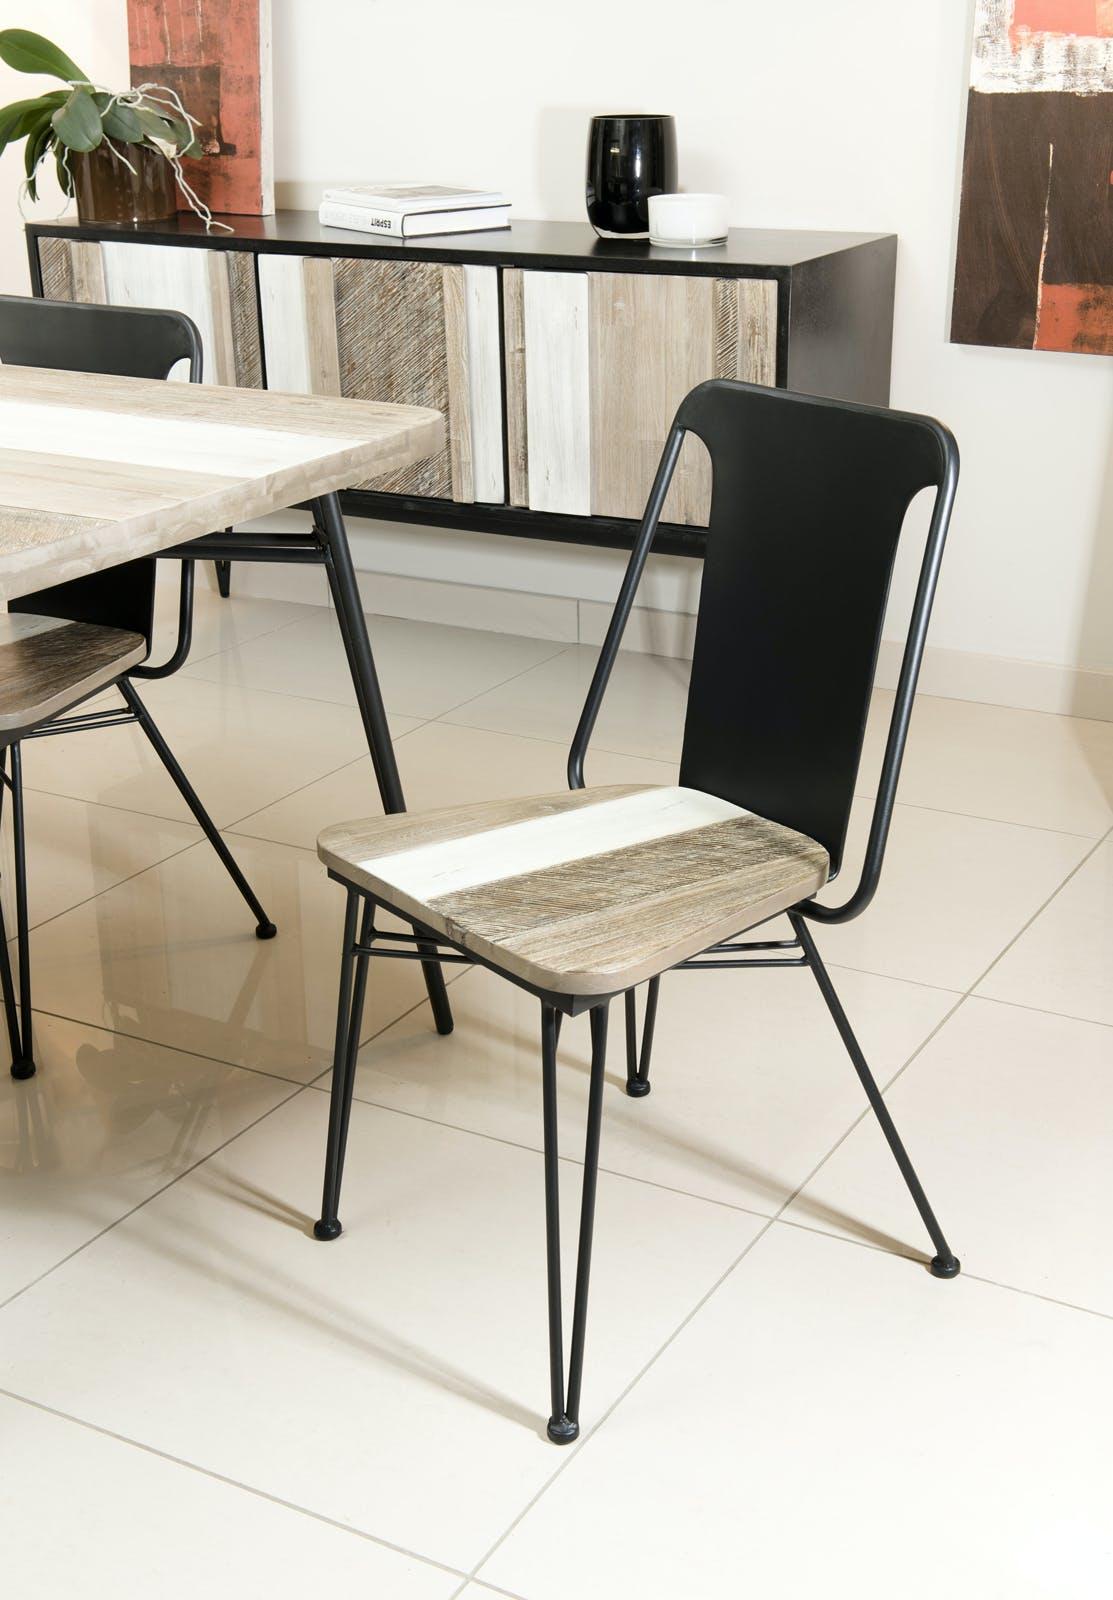 Chaise en Acacia massif bandes teintes variées et métal noir 50,5x49x85cm CADIX